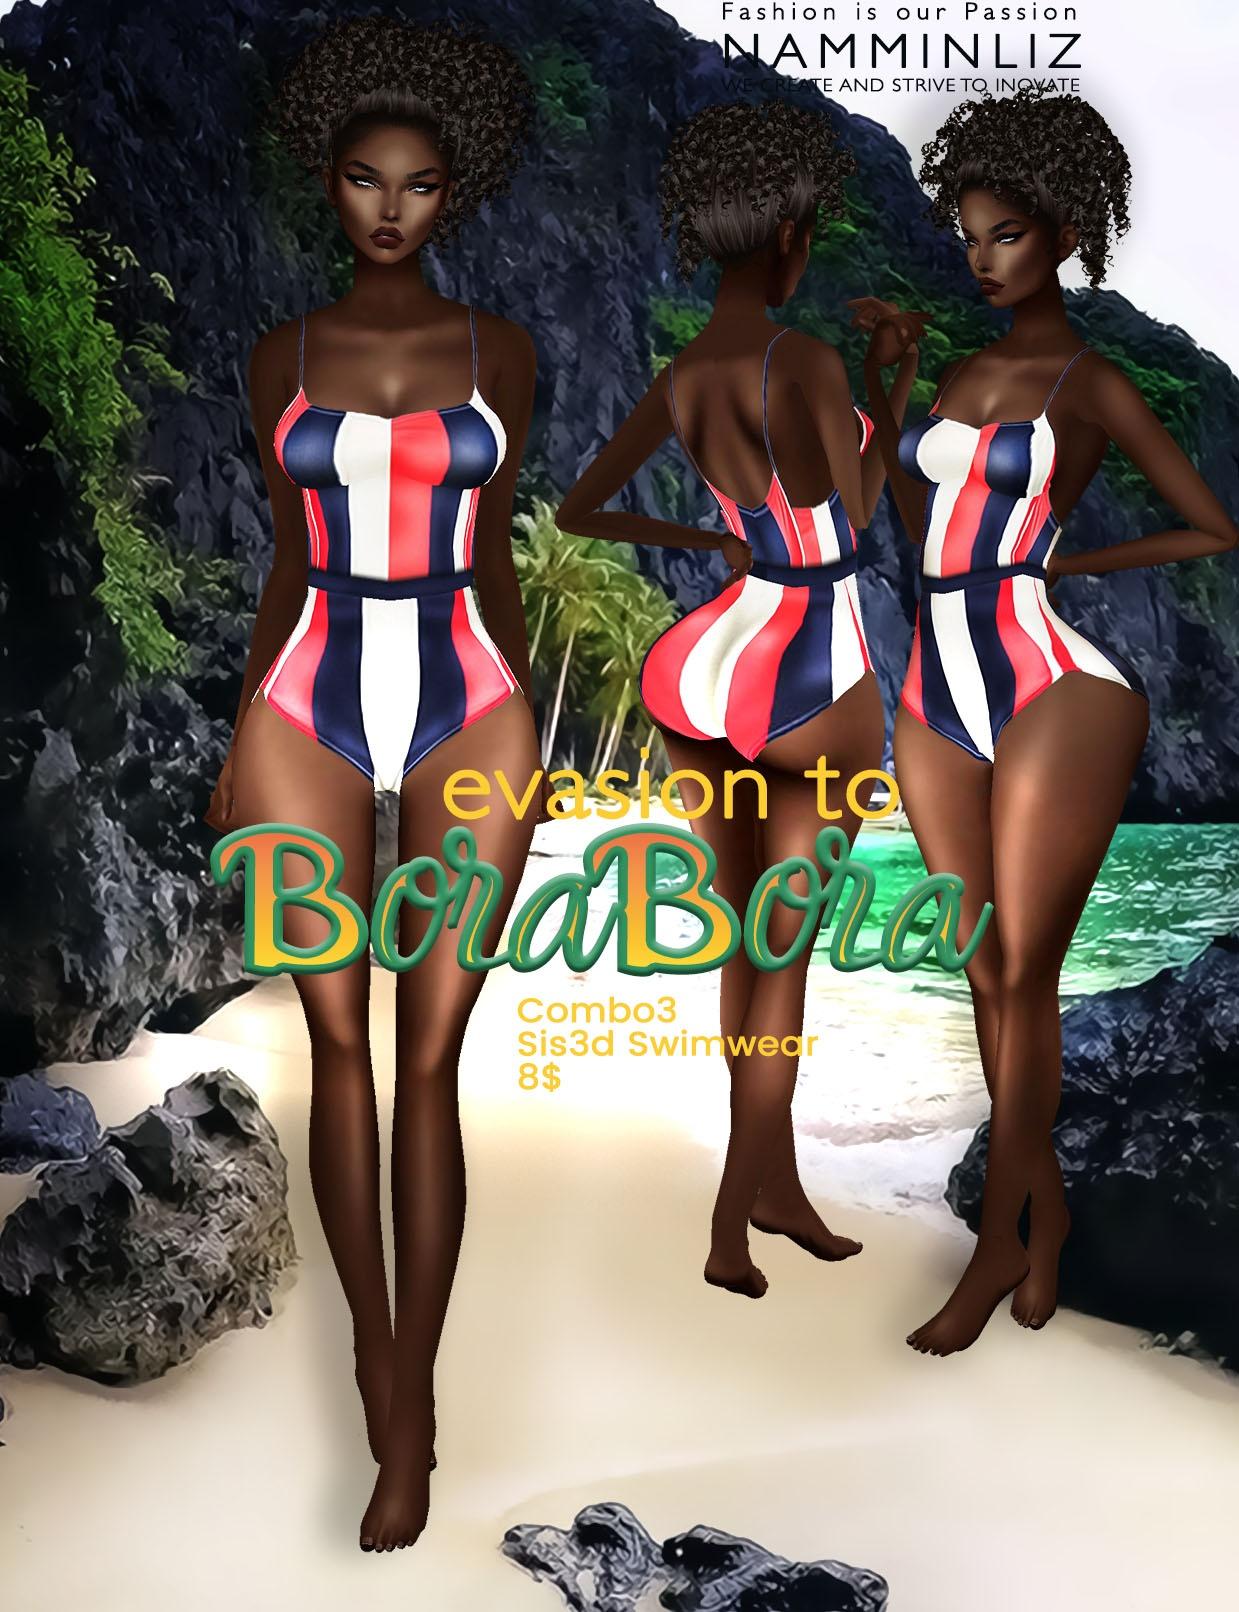 Evasion to Bora Bora combo3 Sis3d swimwear imvu NAMMINLIZ